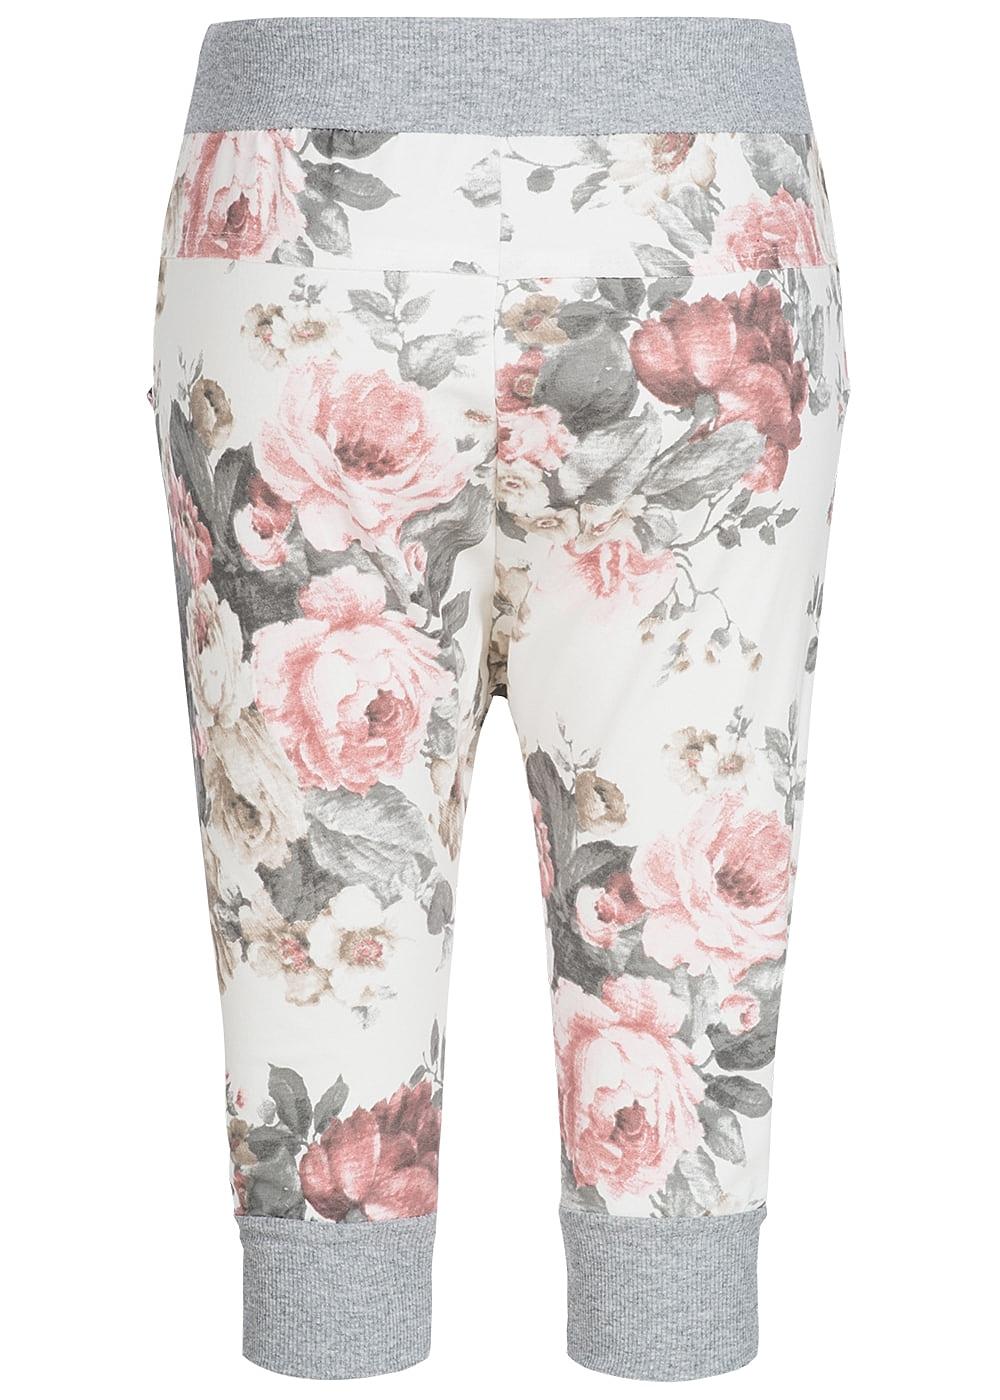 styleboom fashion damen capri sweat short blumen muster weiss rosa braun 77onlineshop. Black Bedroom Furniture Sets. Home Design Ideas